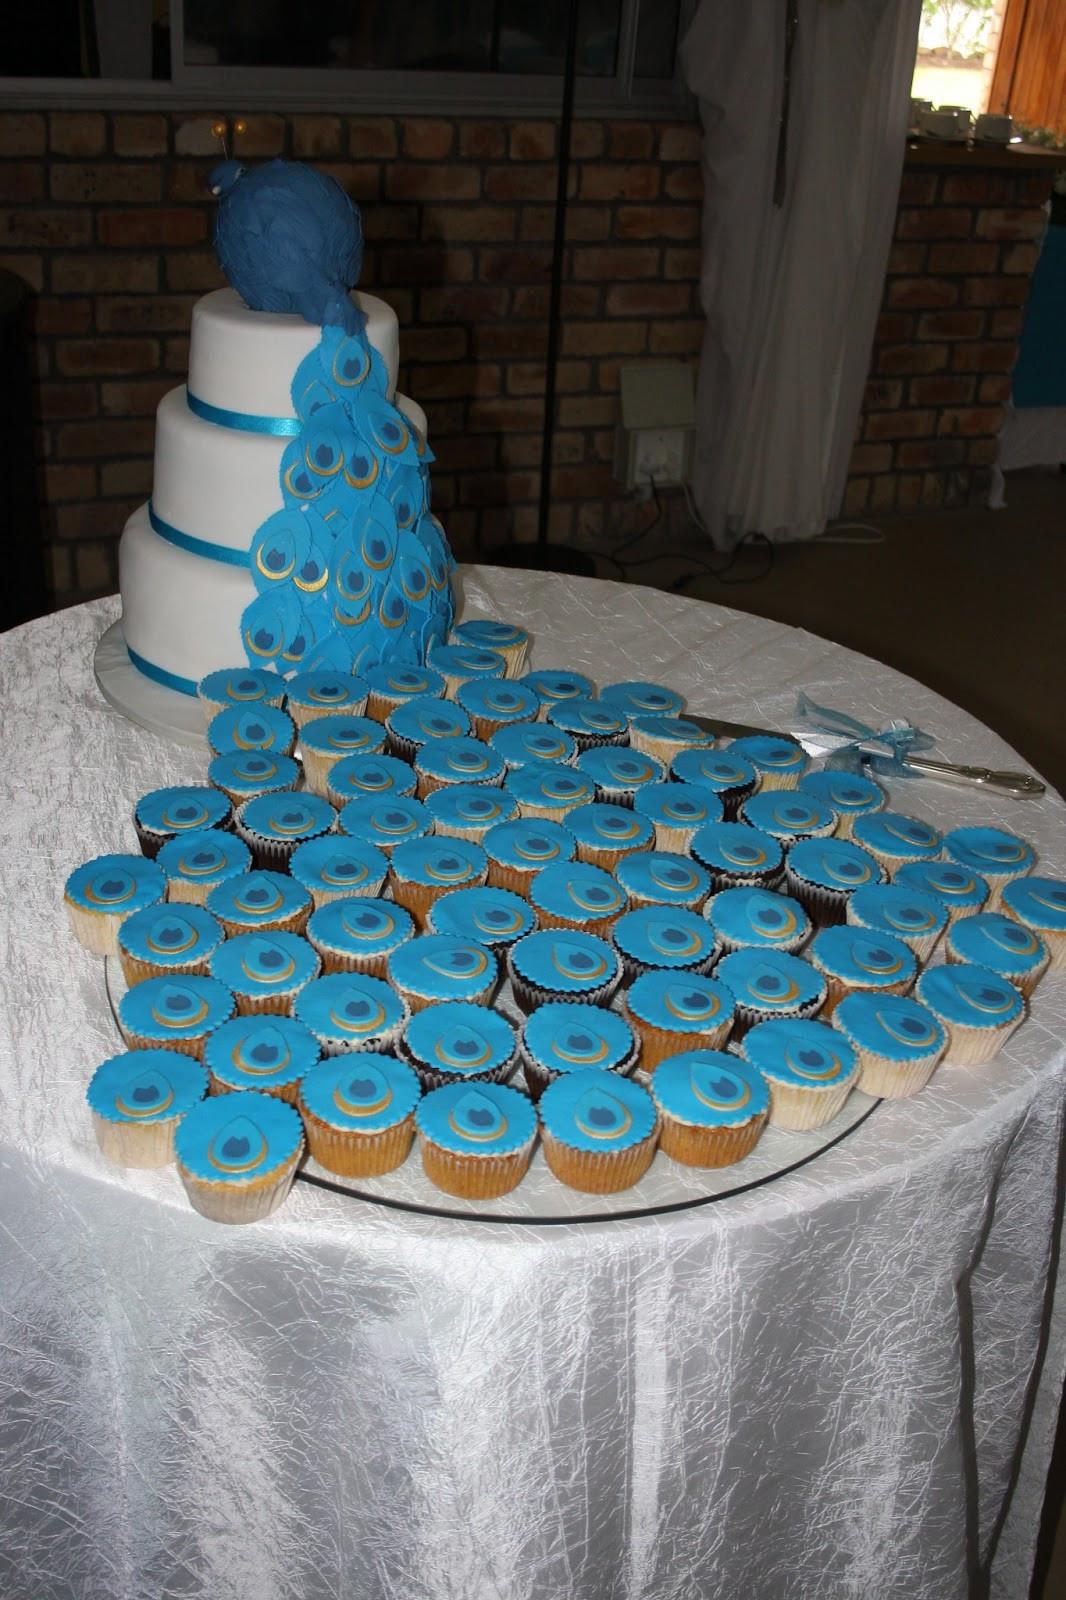 Peacock Wedding Cake With Cupcakes  Koekerasie Peacock cake and cupcakes